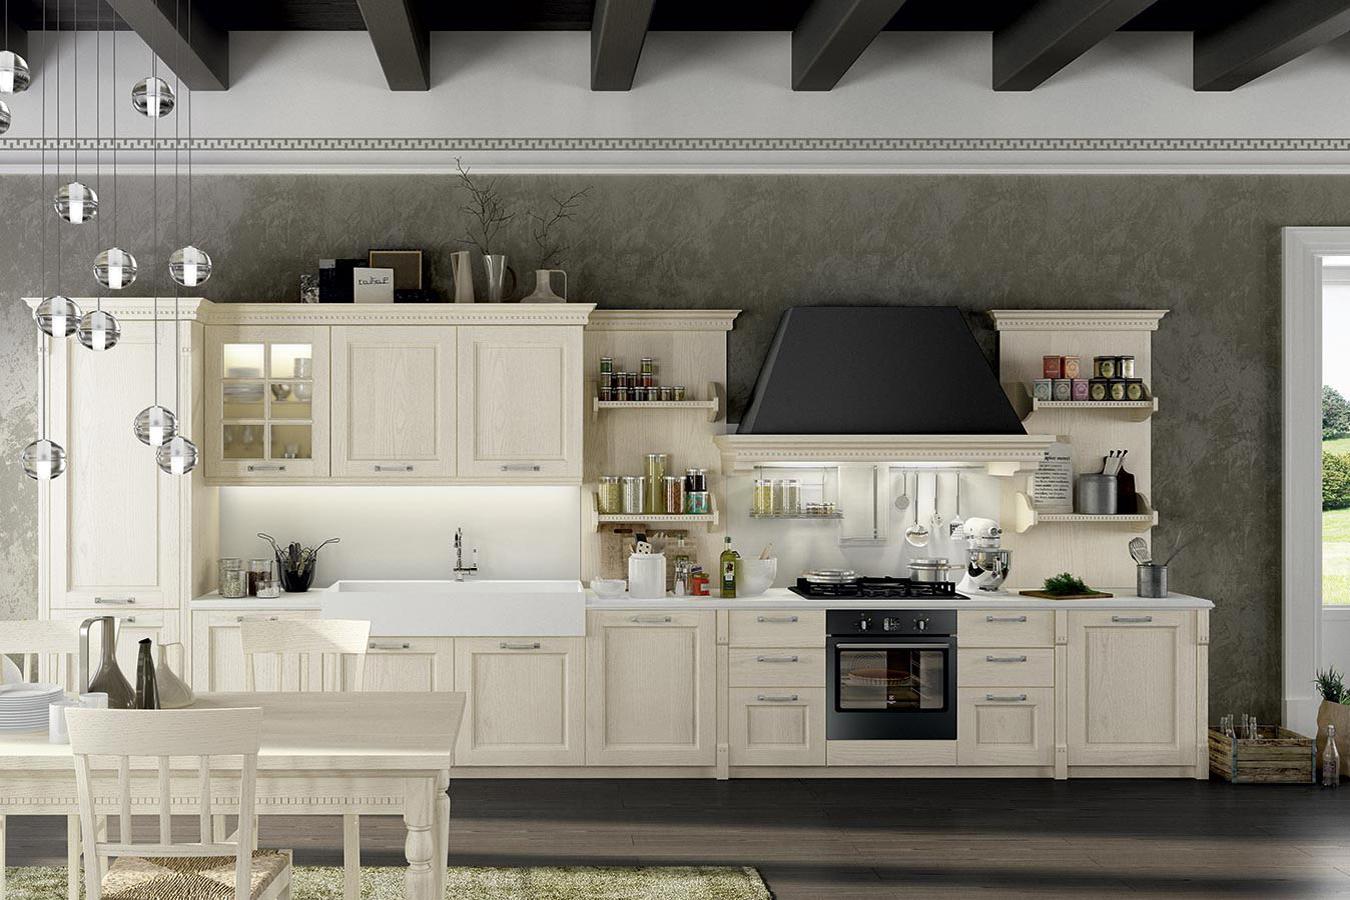 Arredamento cucine classiche beautiful cucine classiche for Tre erre arredamenti